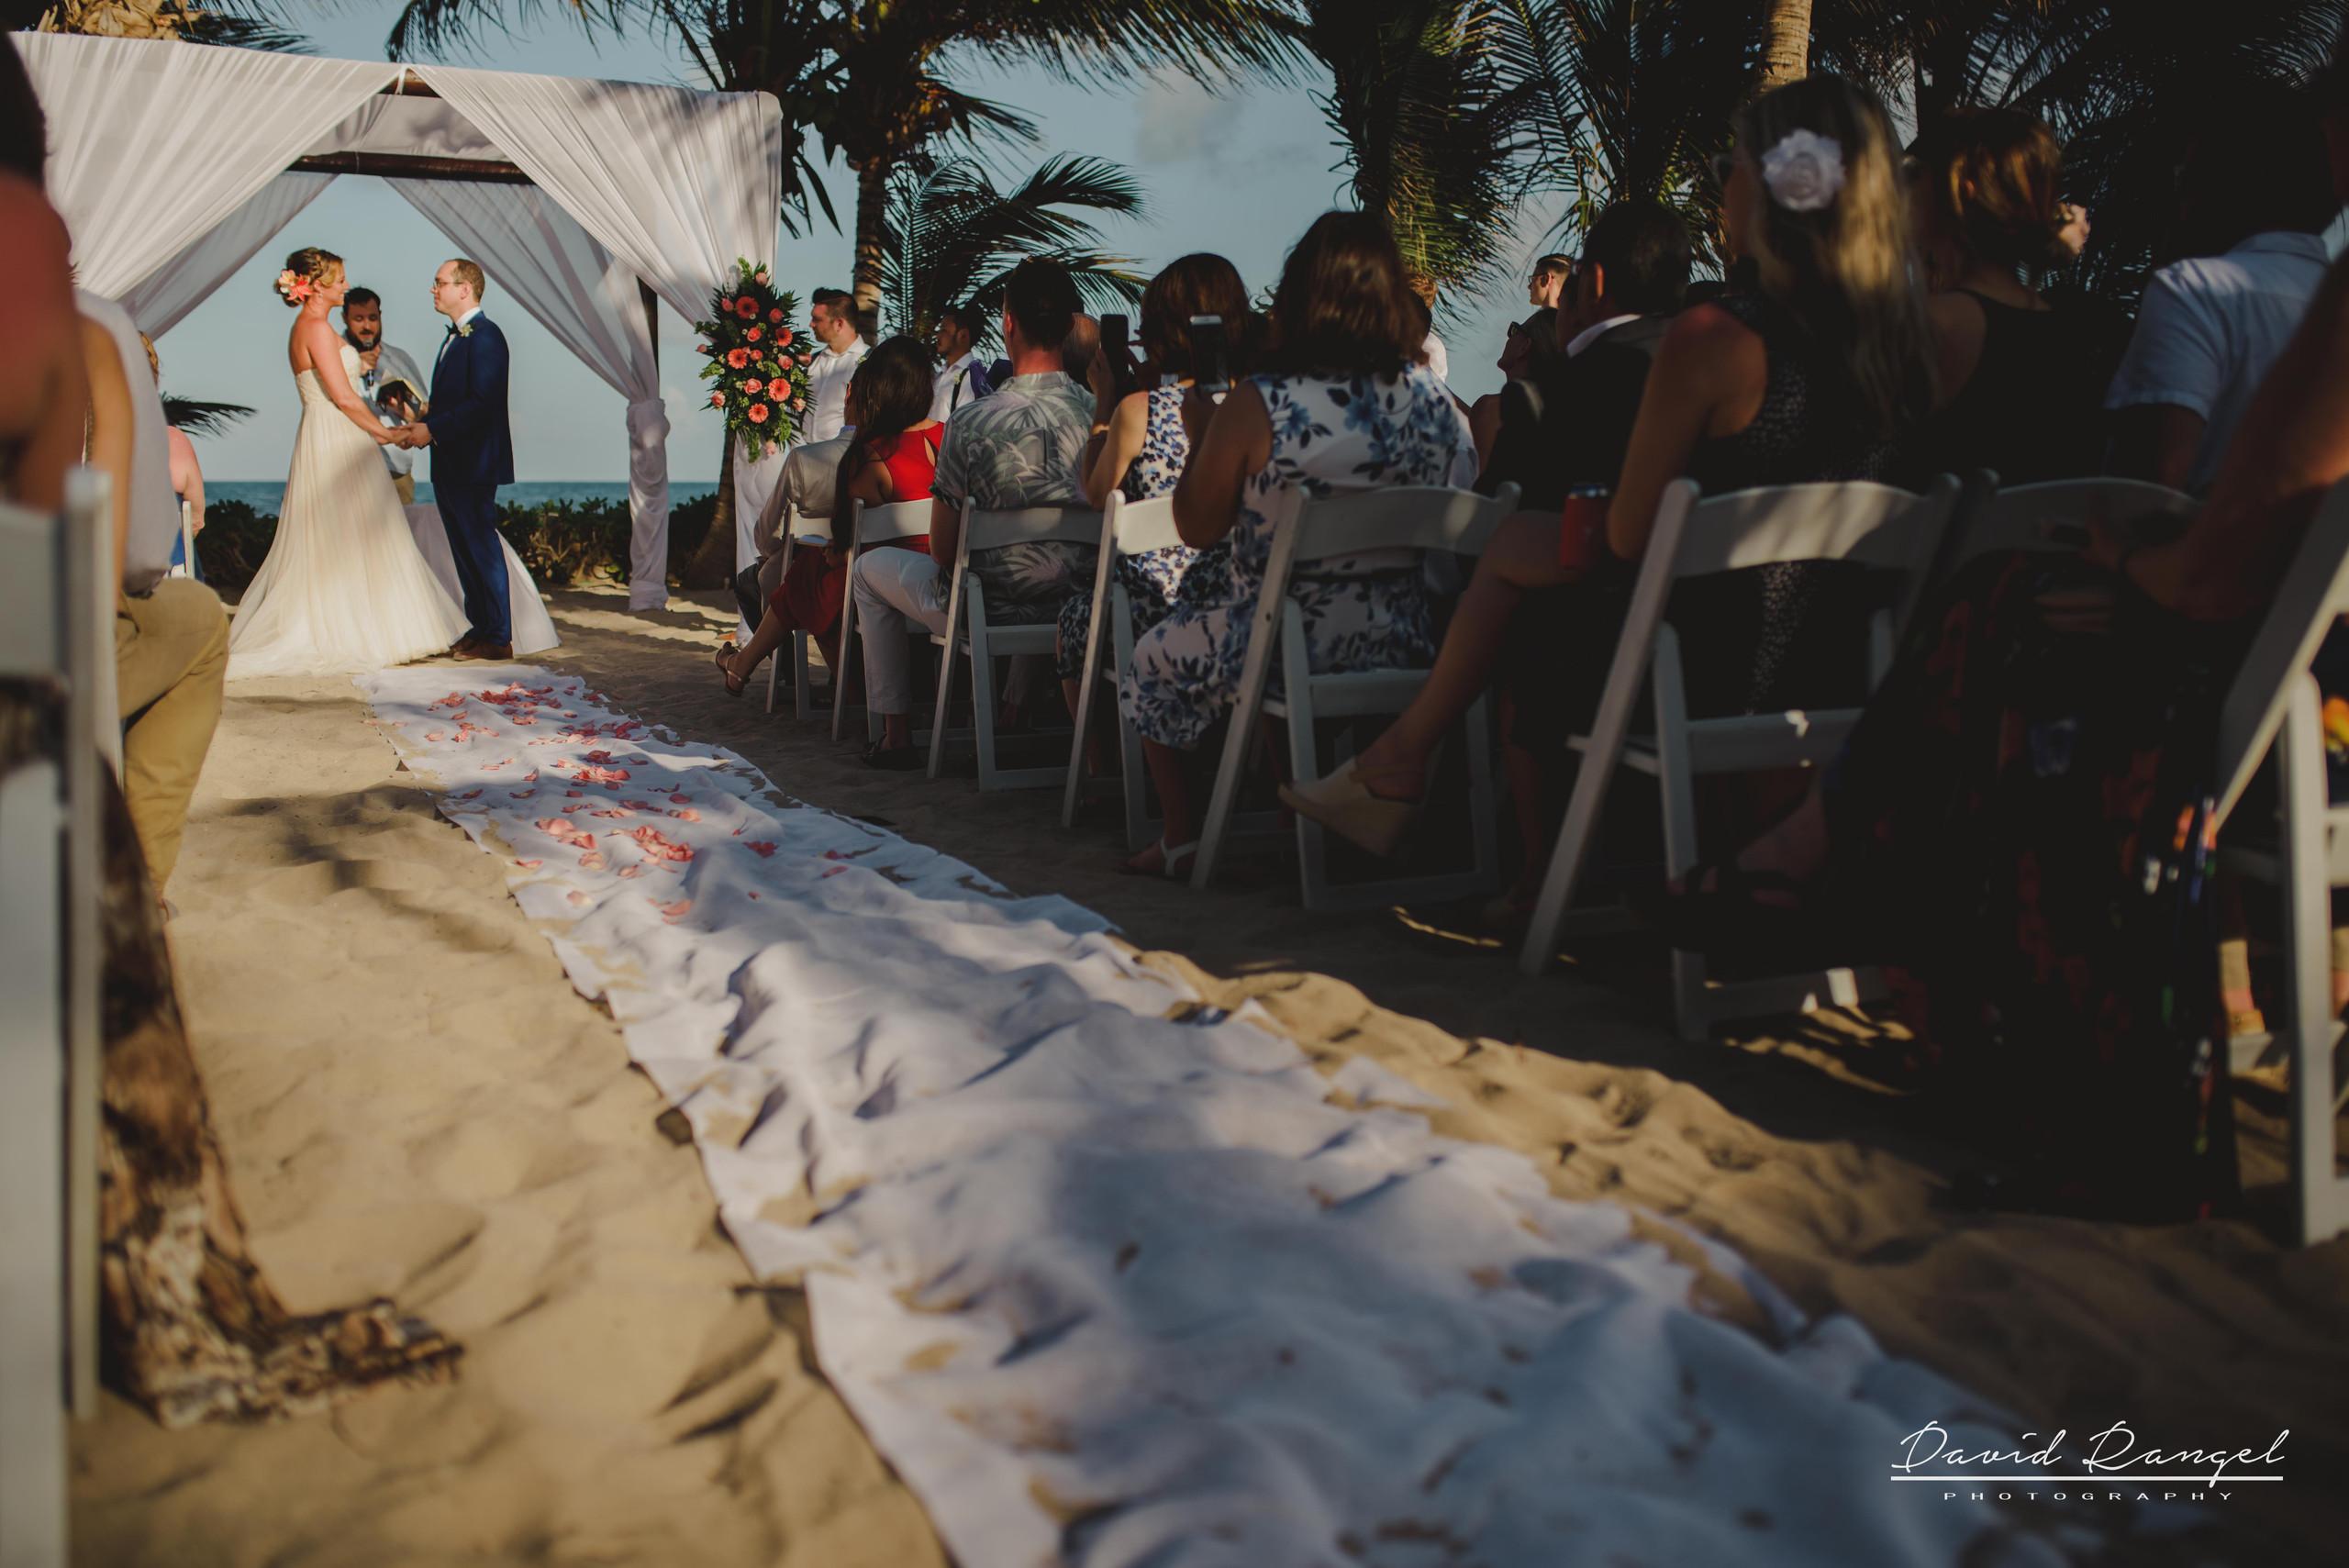 wedding+gazebo+beach+ceremony+photo+groom+bride+aisle